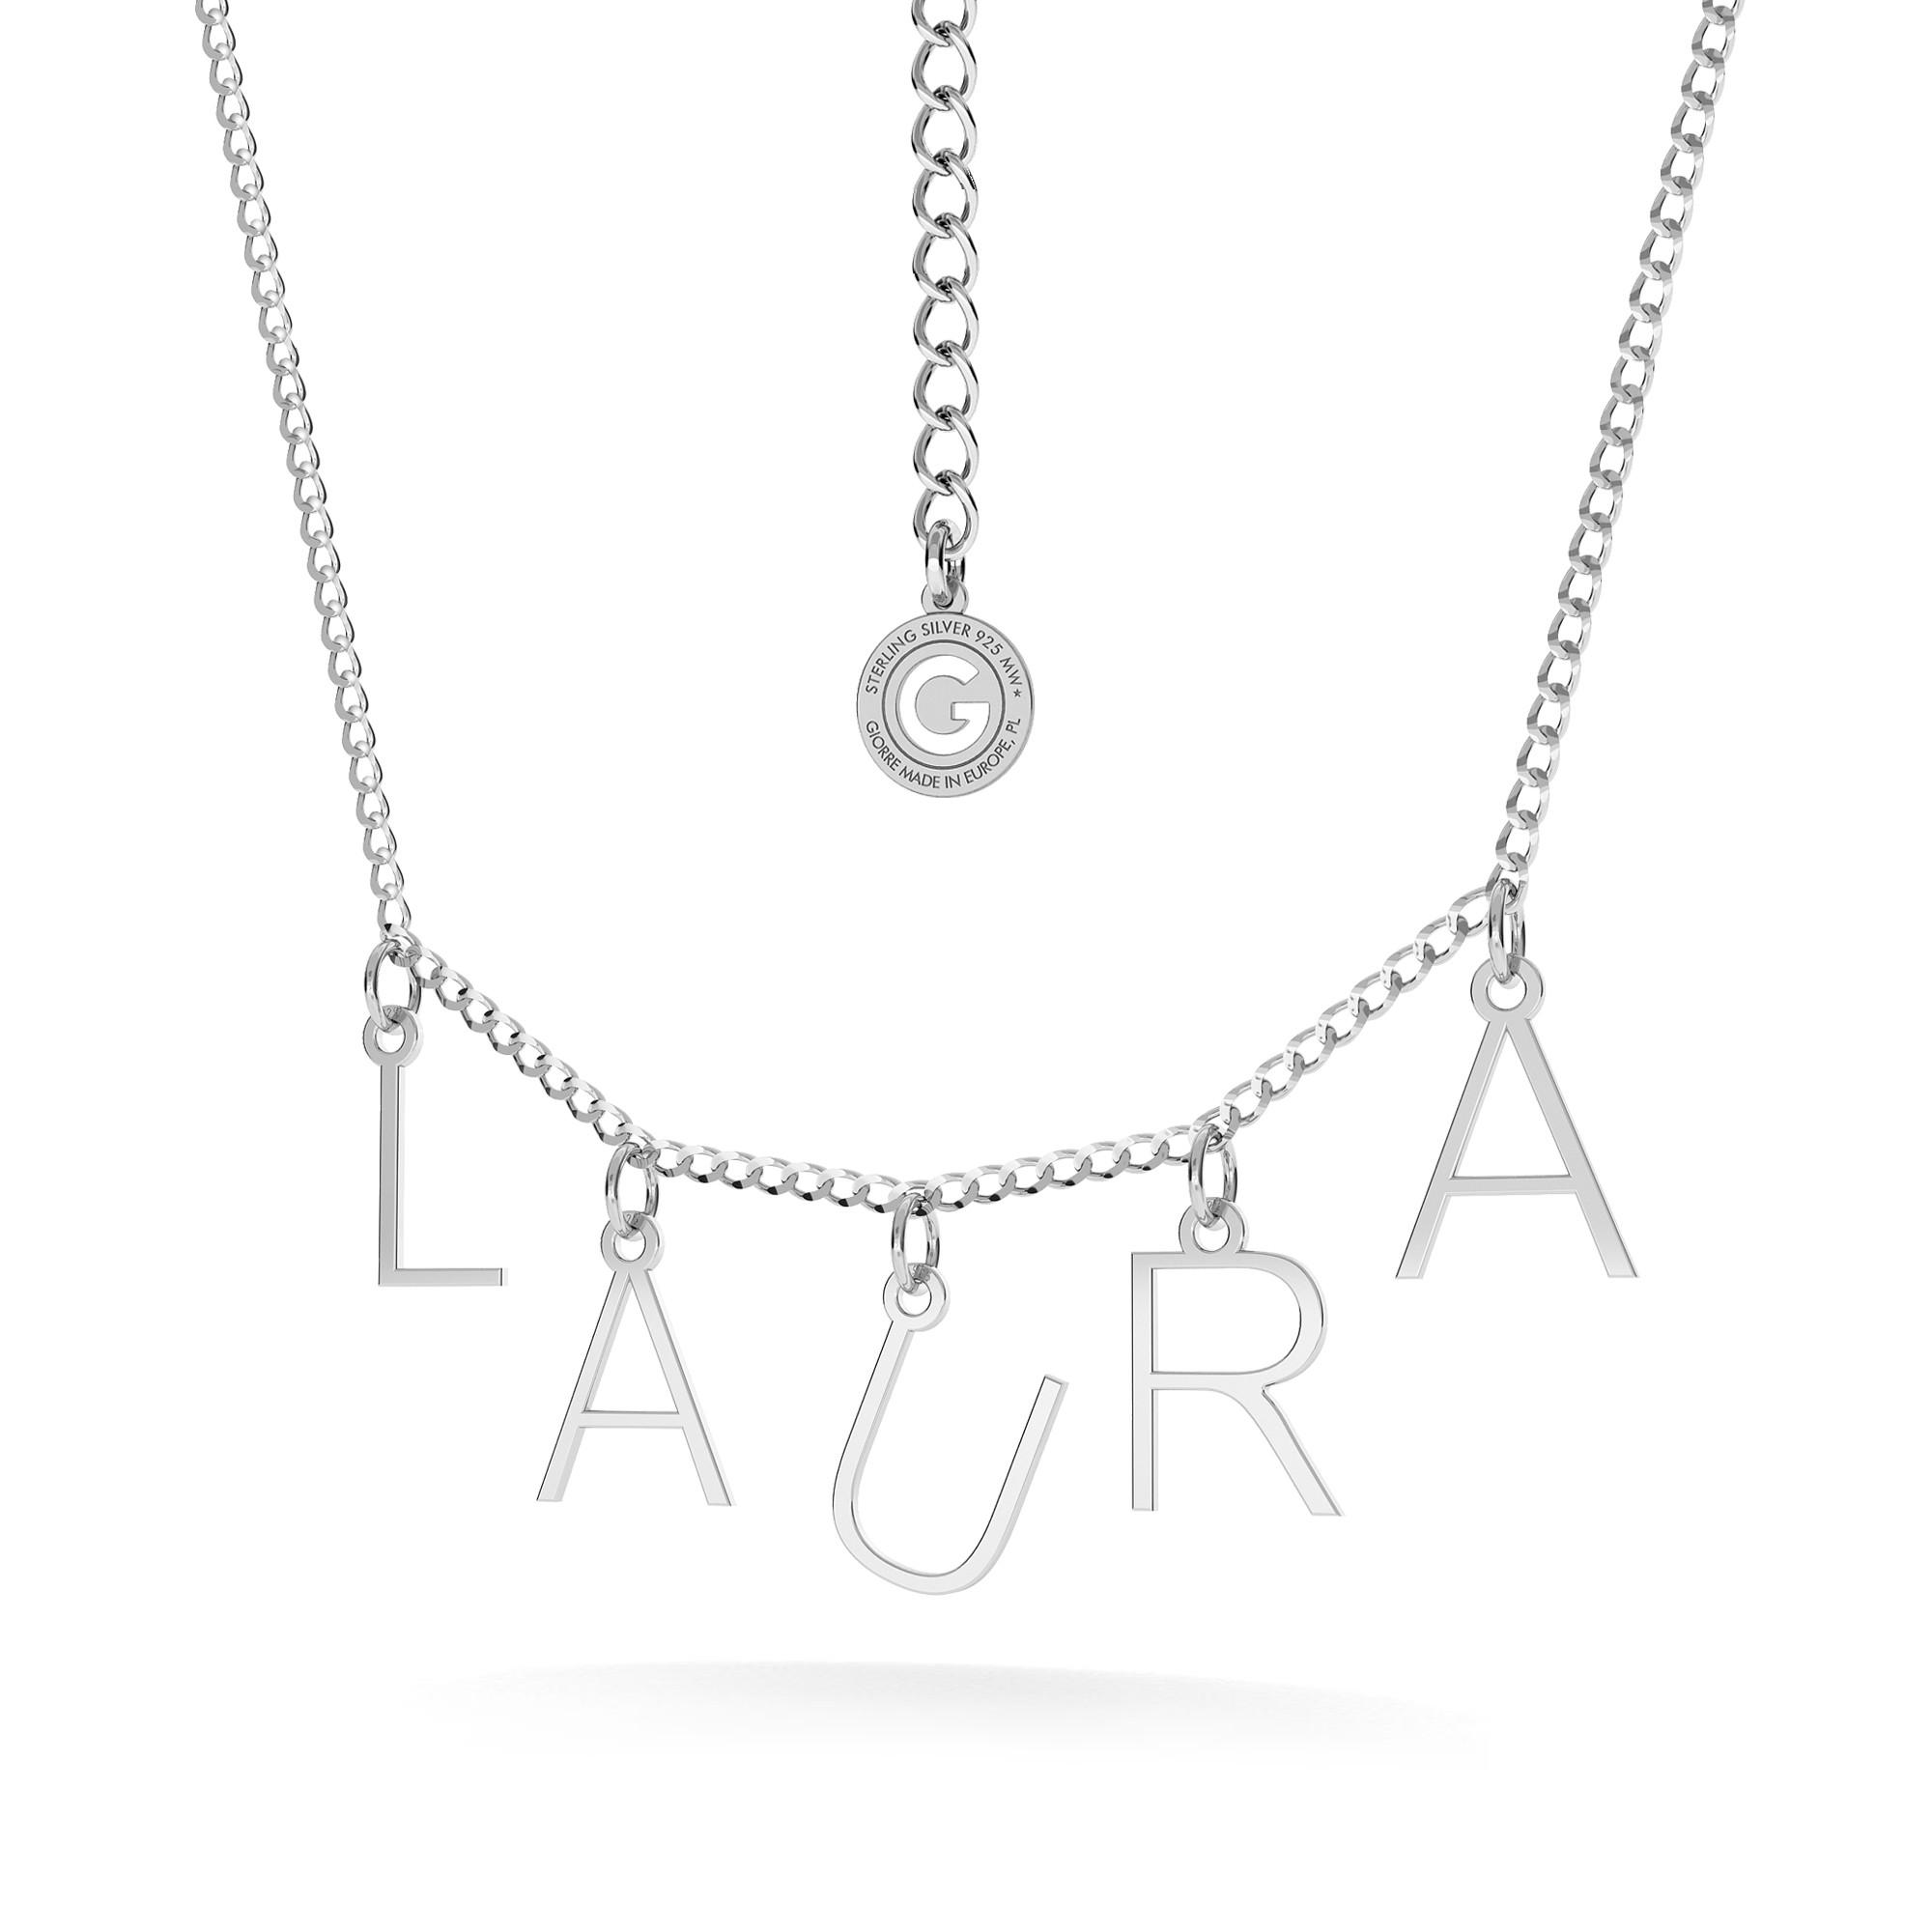 DAGGER necklace 925